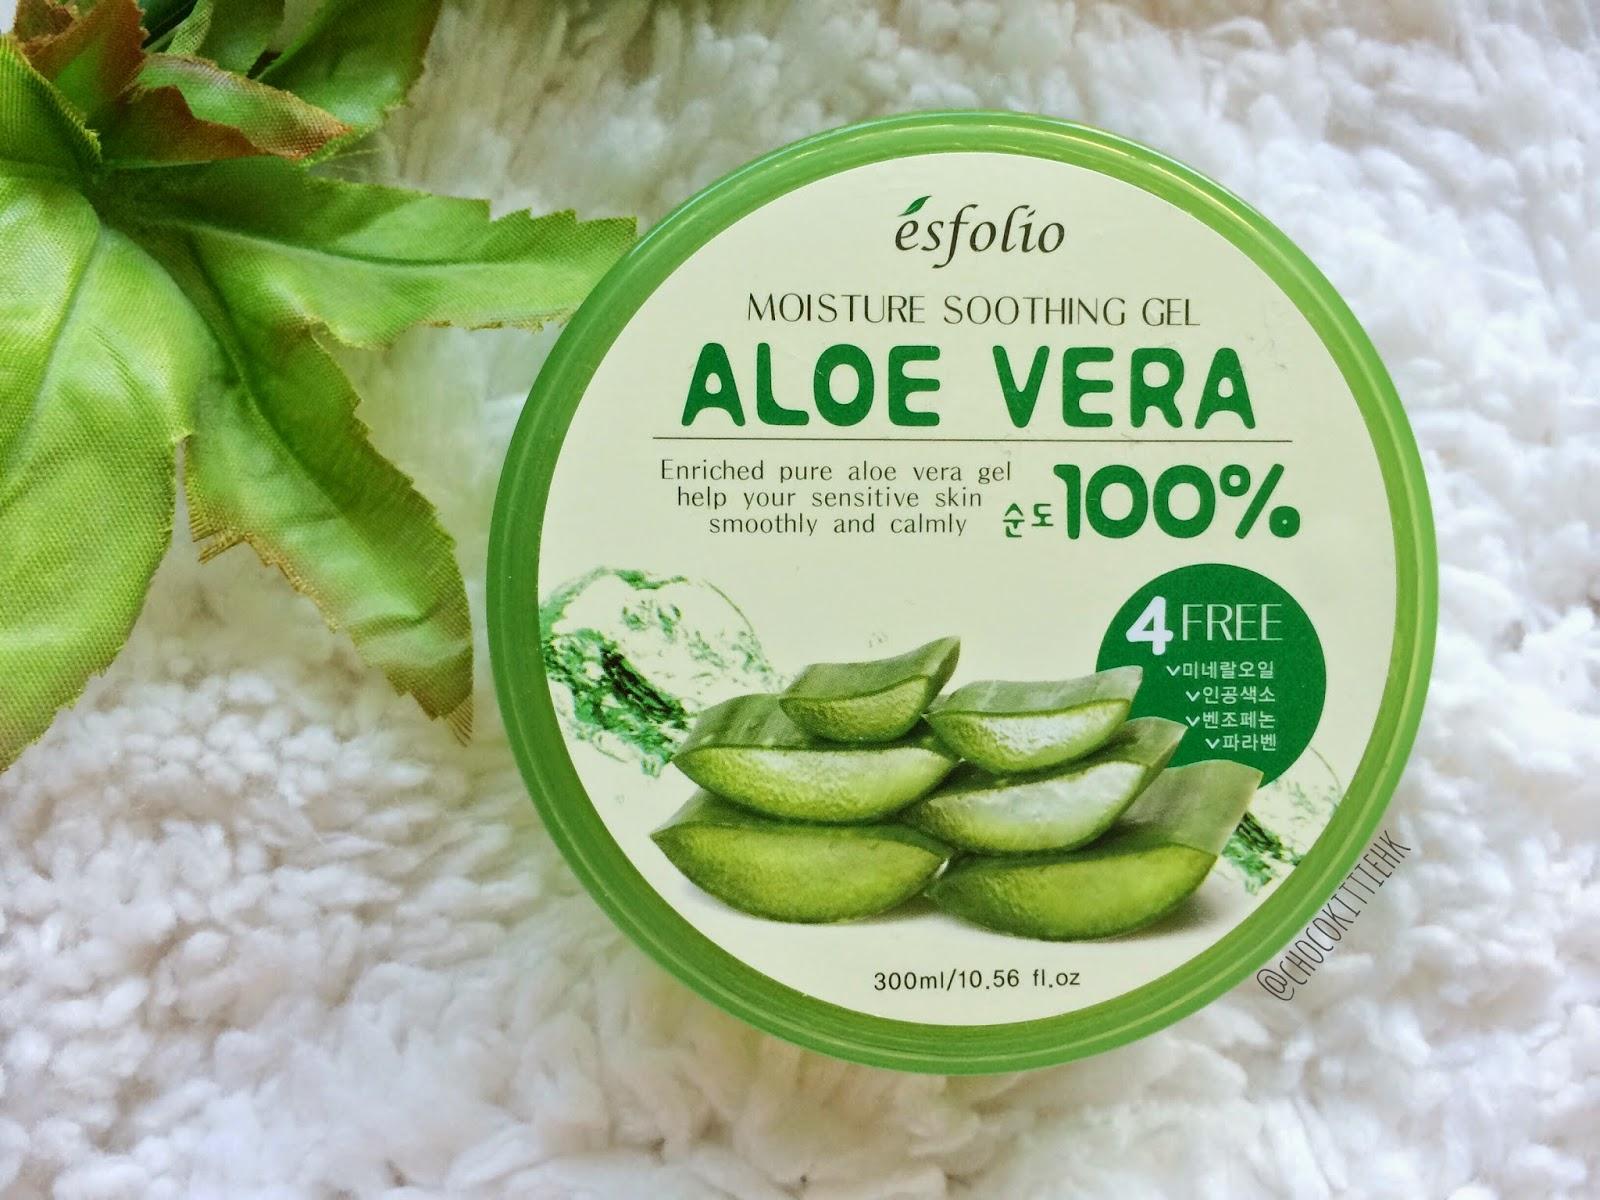 new esfolio 100 aloe vera moisture soothing gel 300 ml ebay. Black Bedroom Furniture Sets. Home Design Ideas